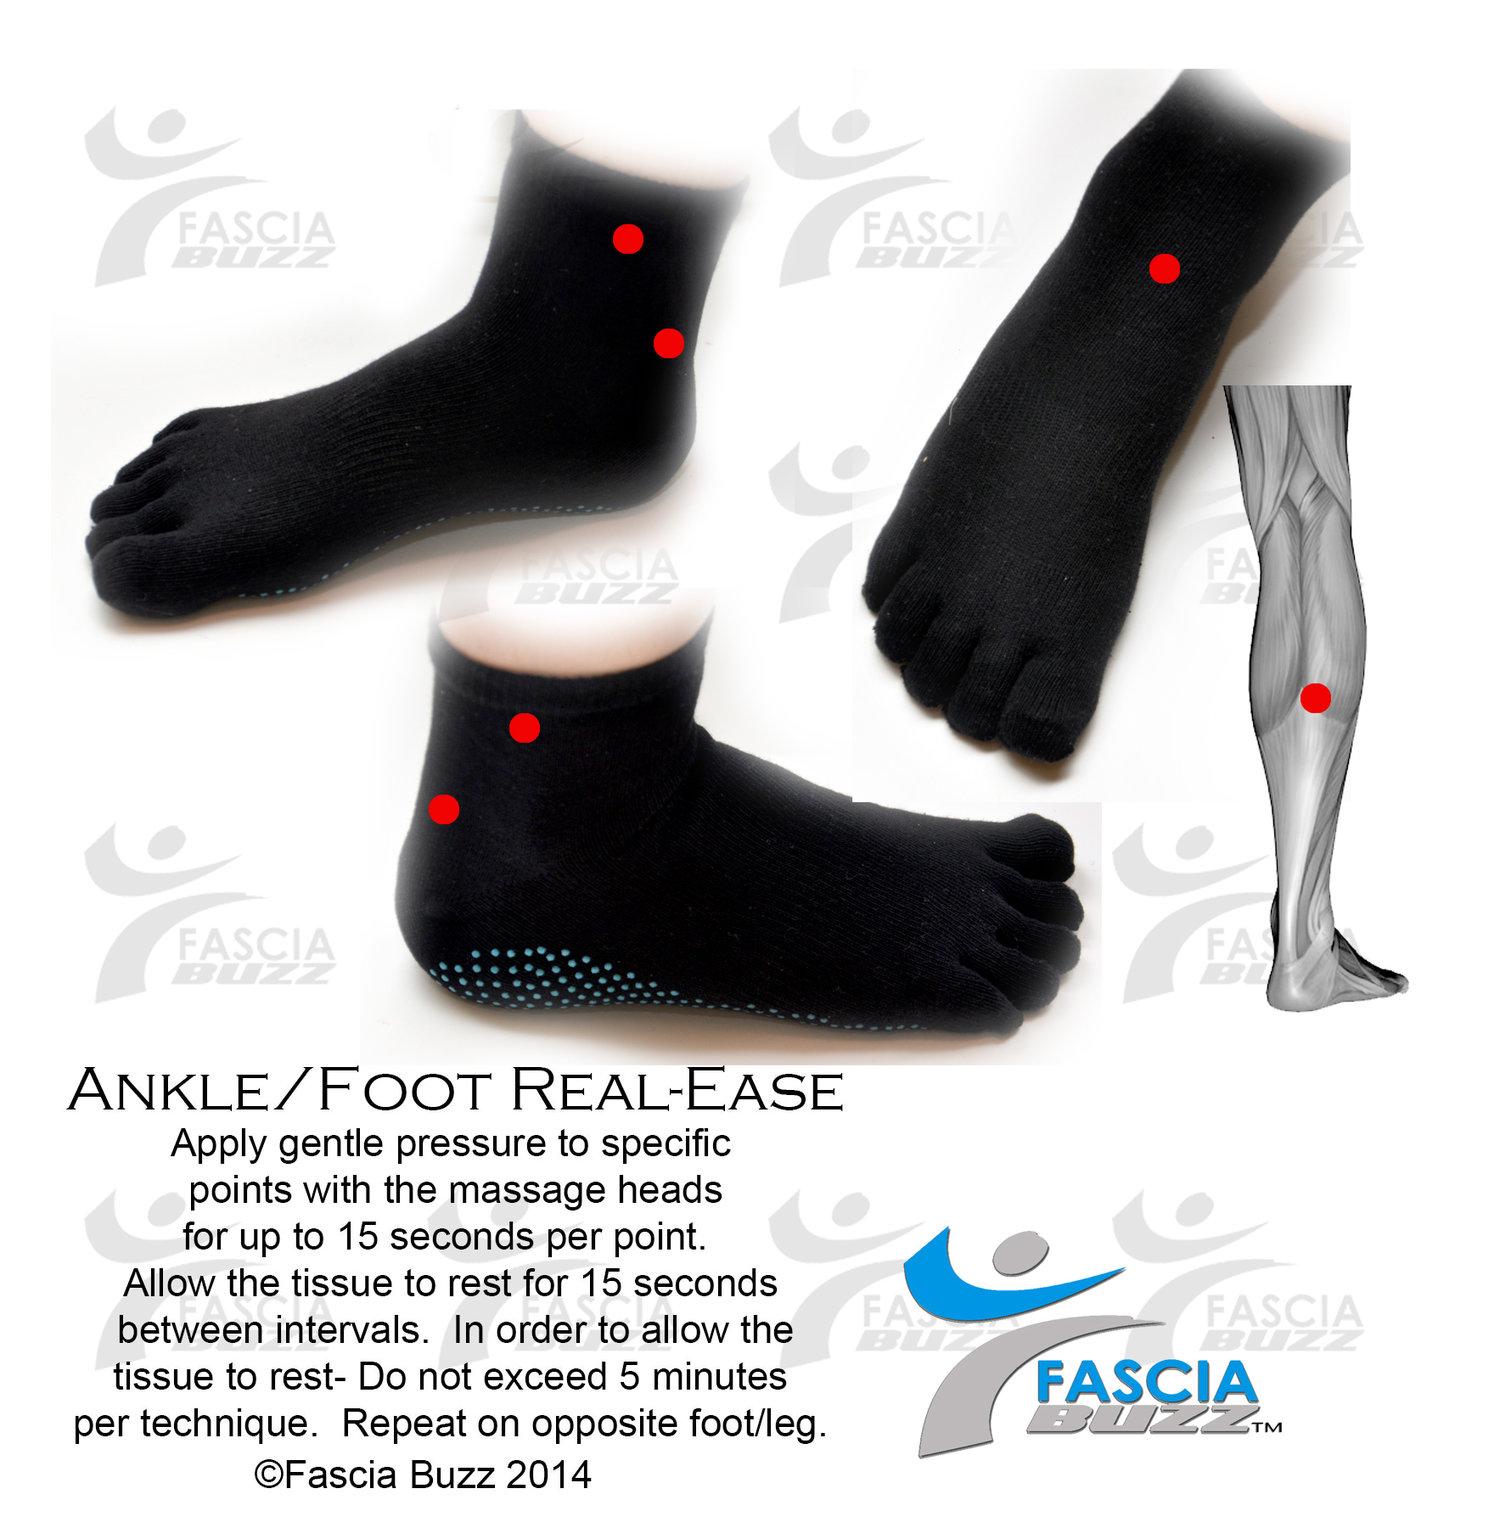 real-ease_ankle foot.jpg